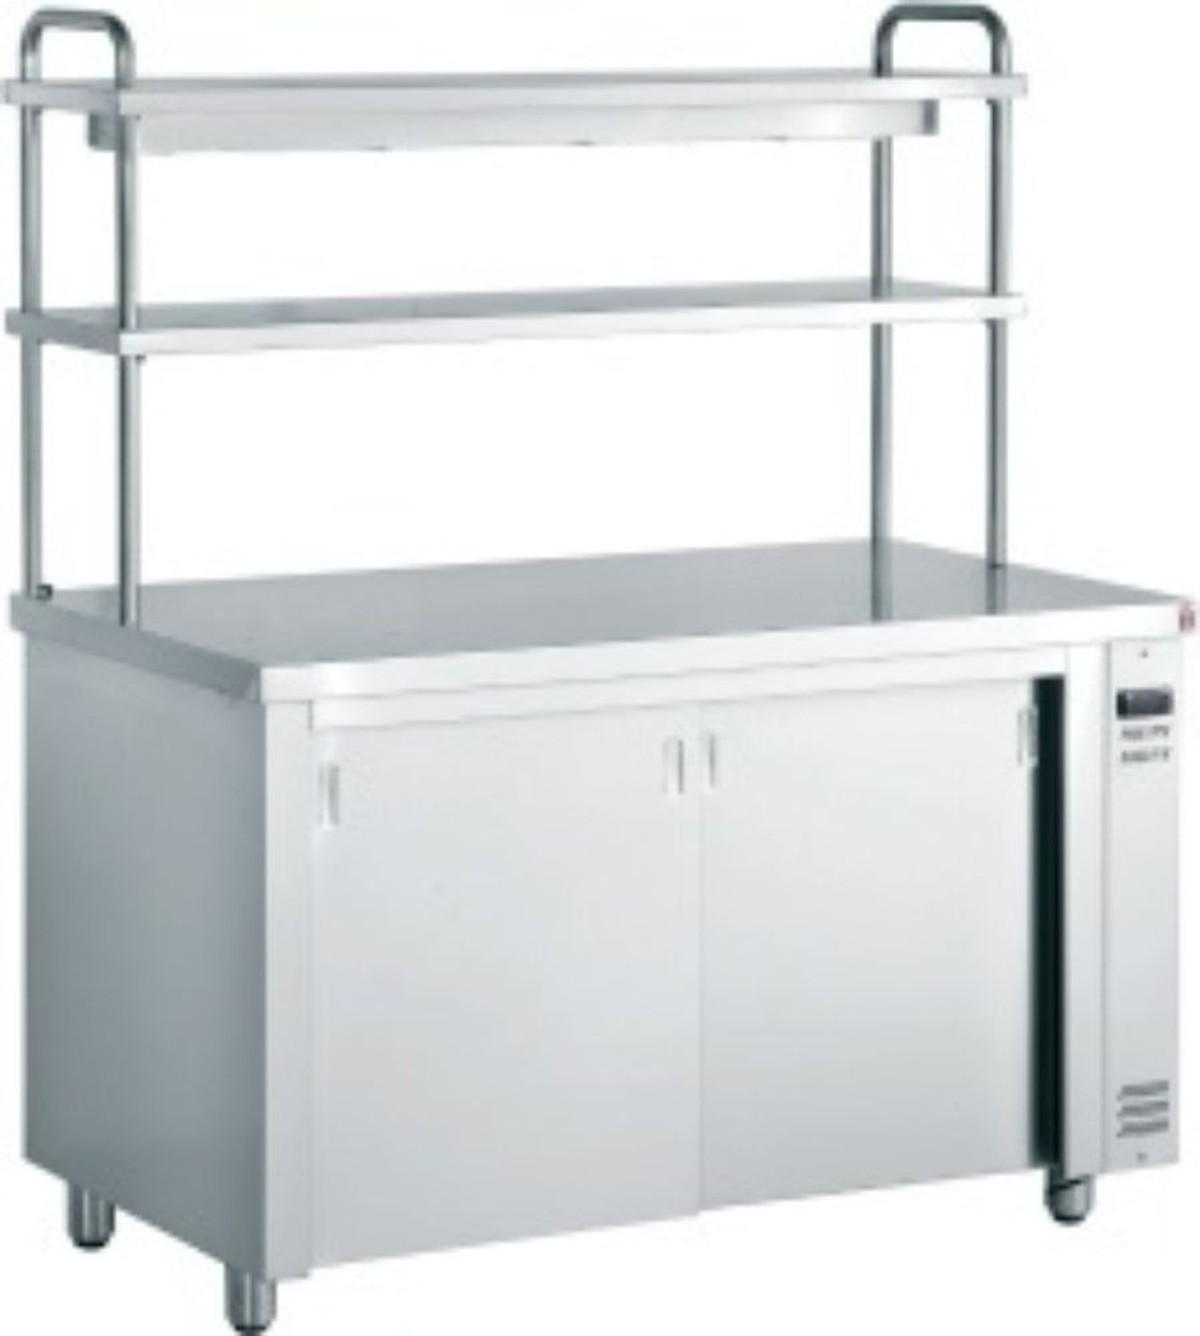 Restaurant Kitchen Pass: Inomak Hot Cupboard With Double Gantry - Hove